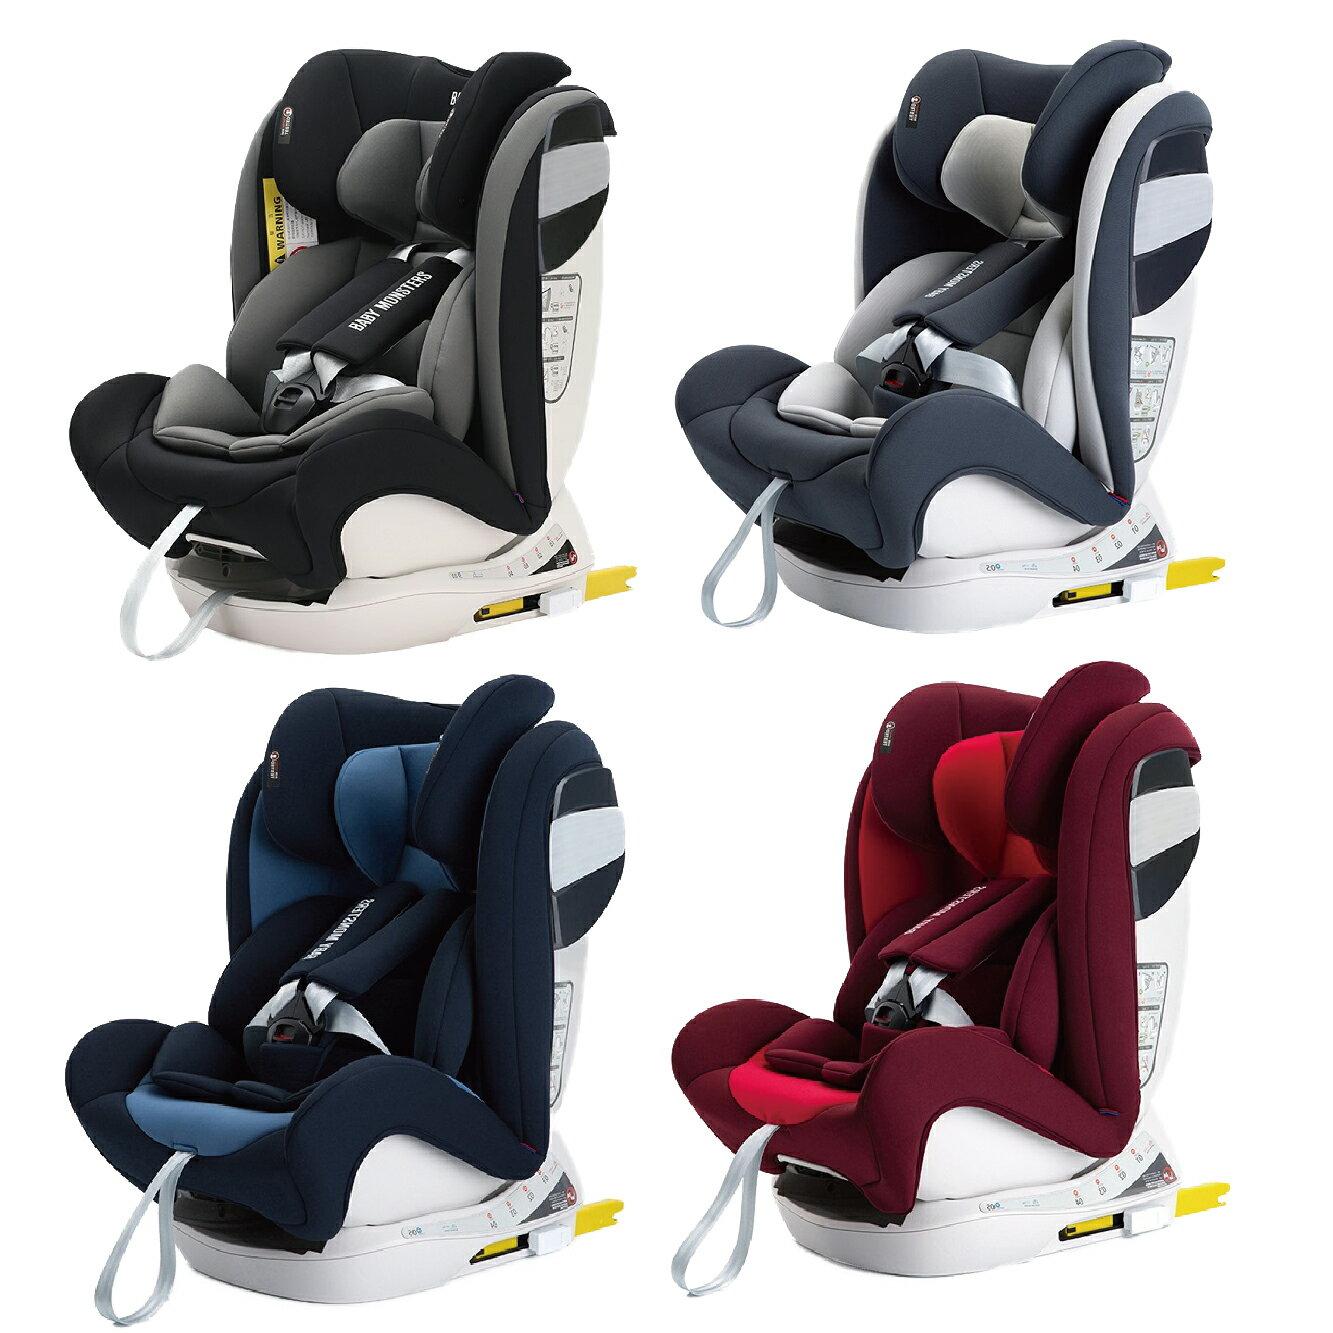 Baby Monsters Guardia 0-12 isofix全階段汽車安全座椅 (四色可選) 618購物節